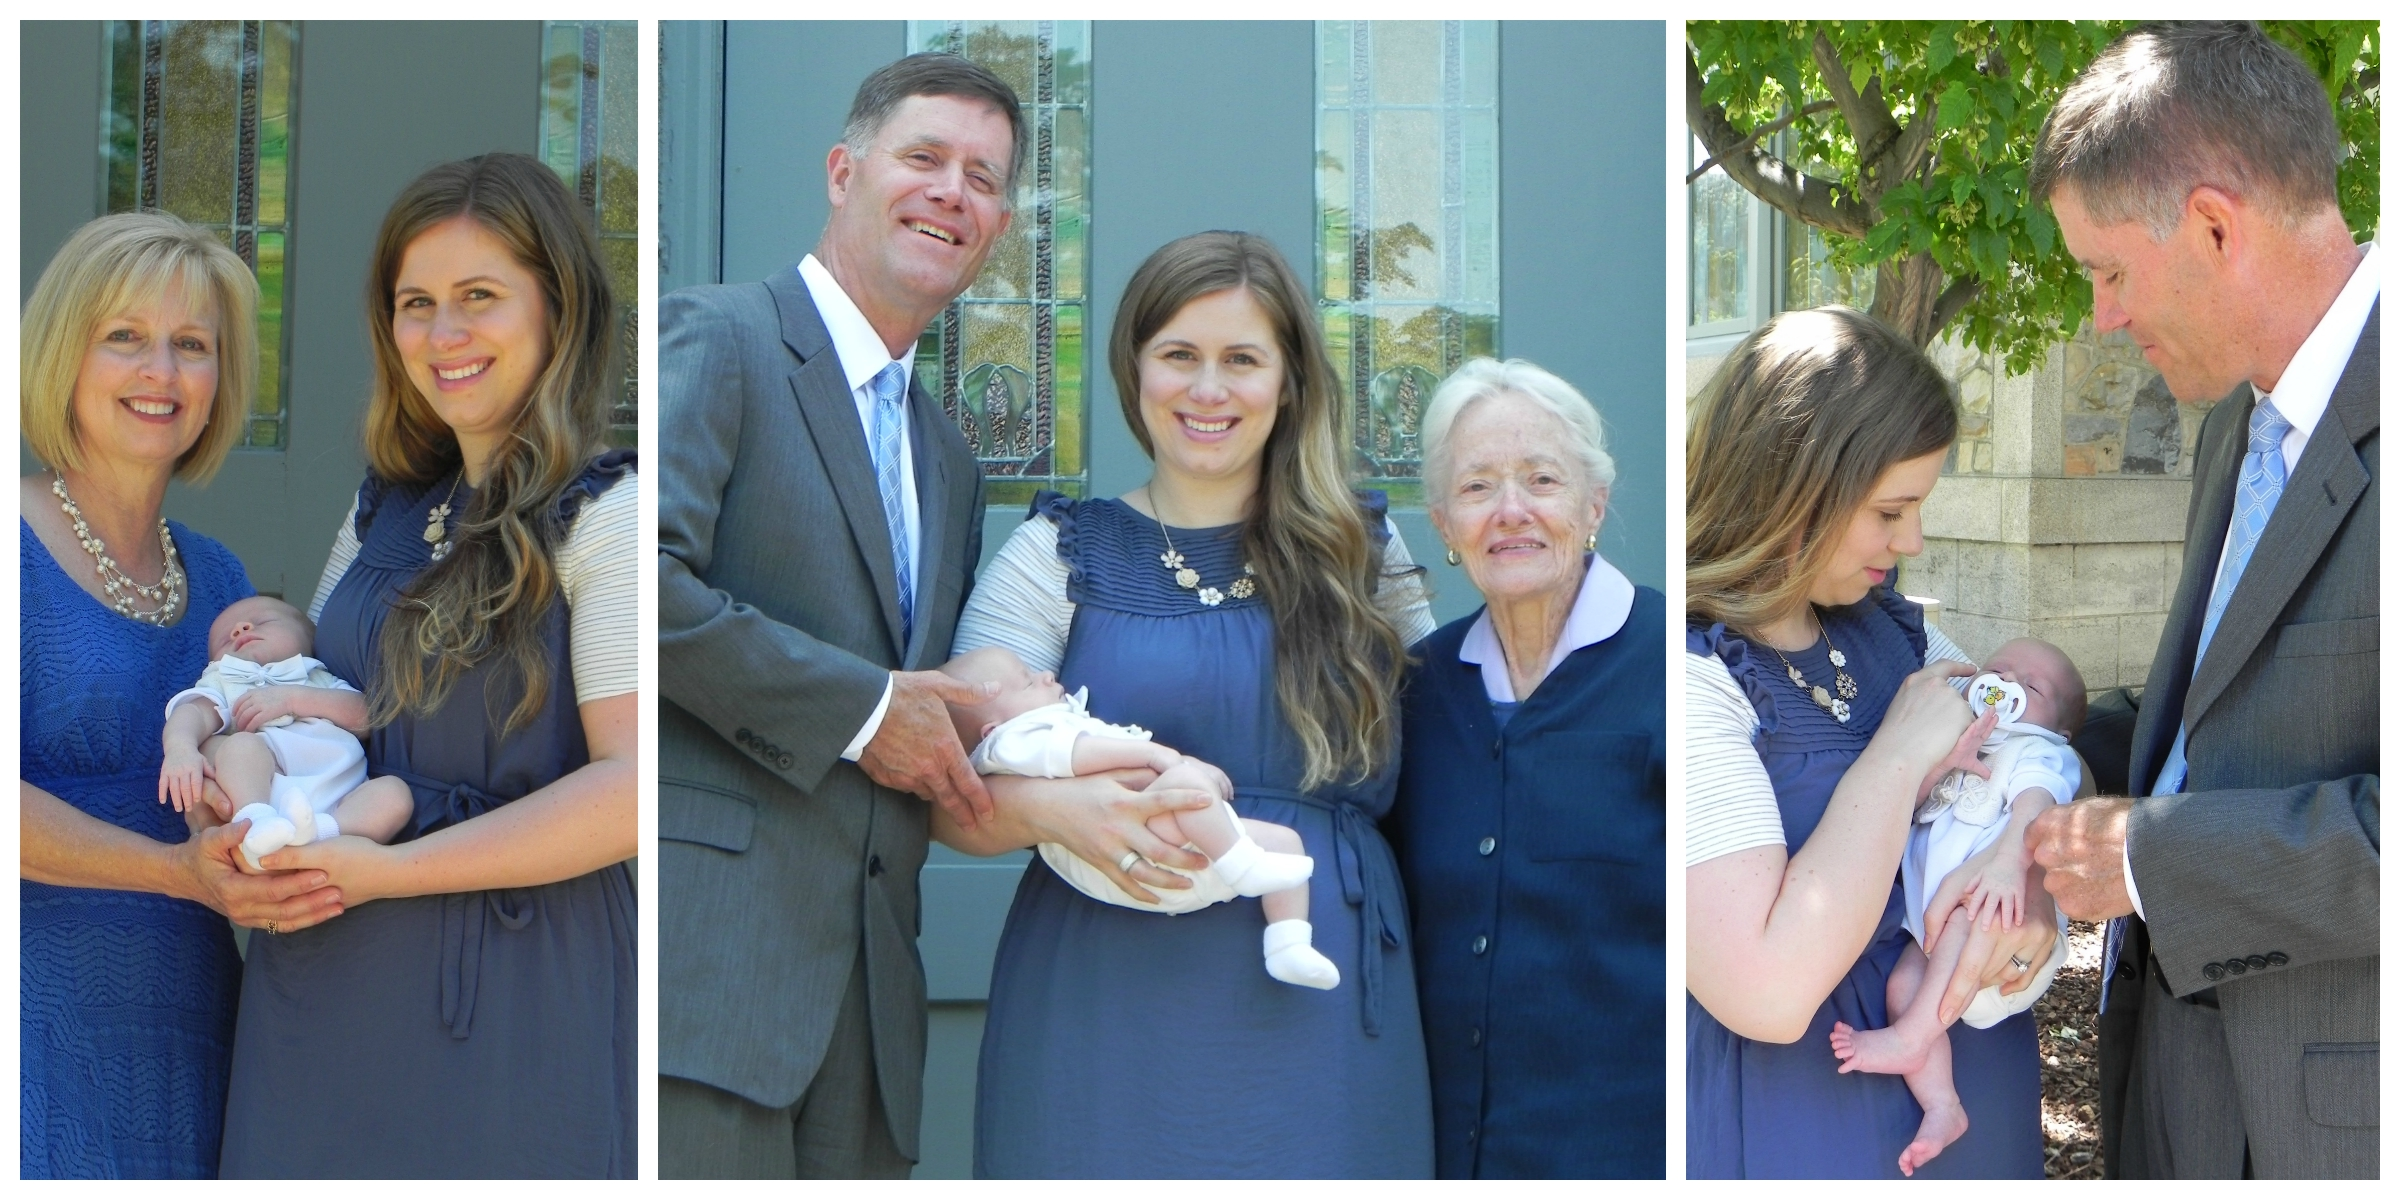 Redd with mama and nana, White 4 generation photo and Redd with mama and papa